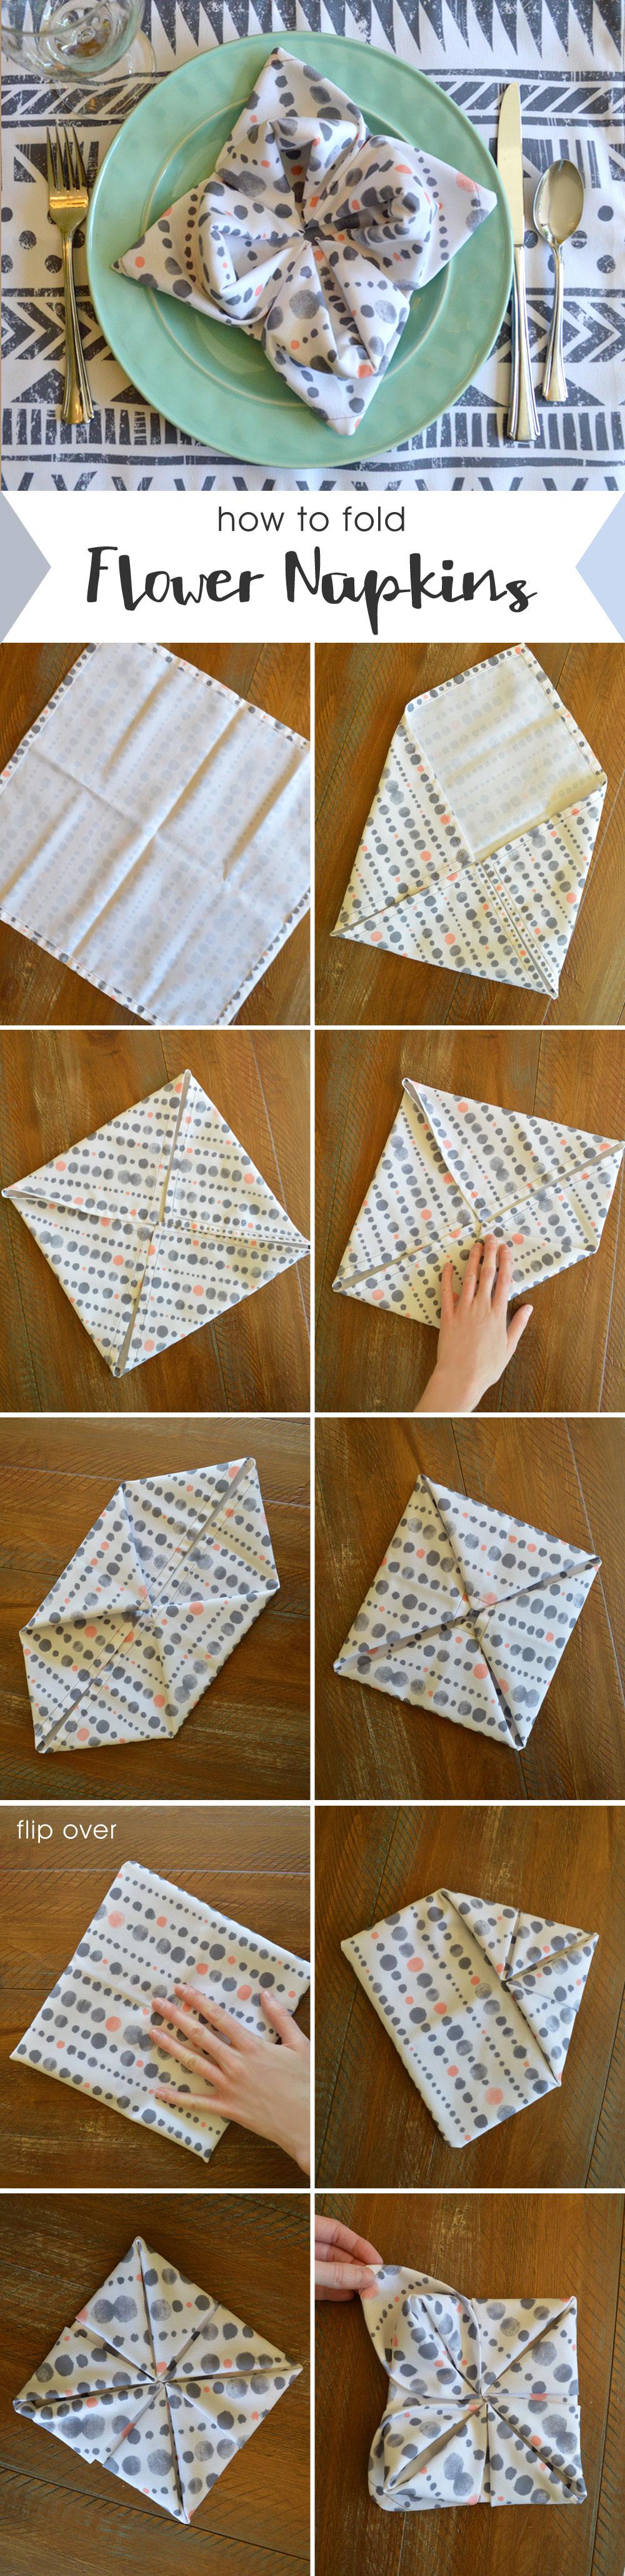 Easy folded cloth napkin flowers - Mommy Scene